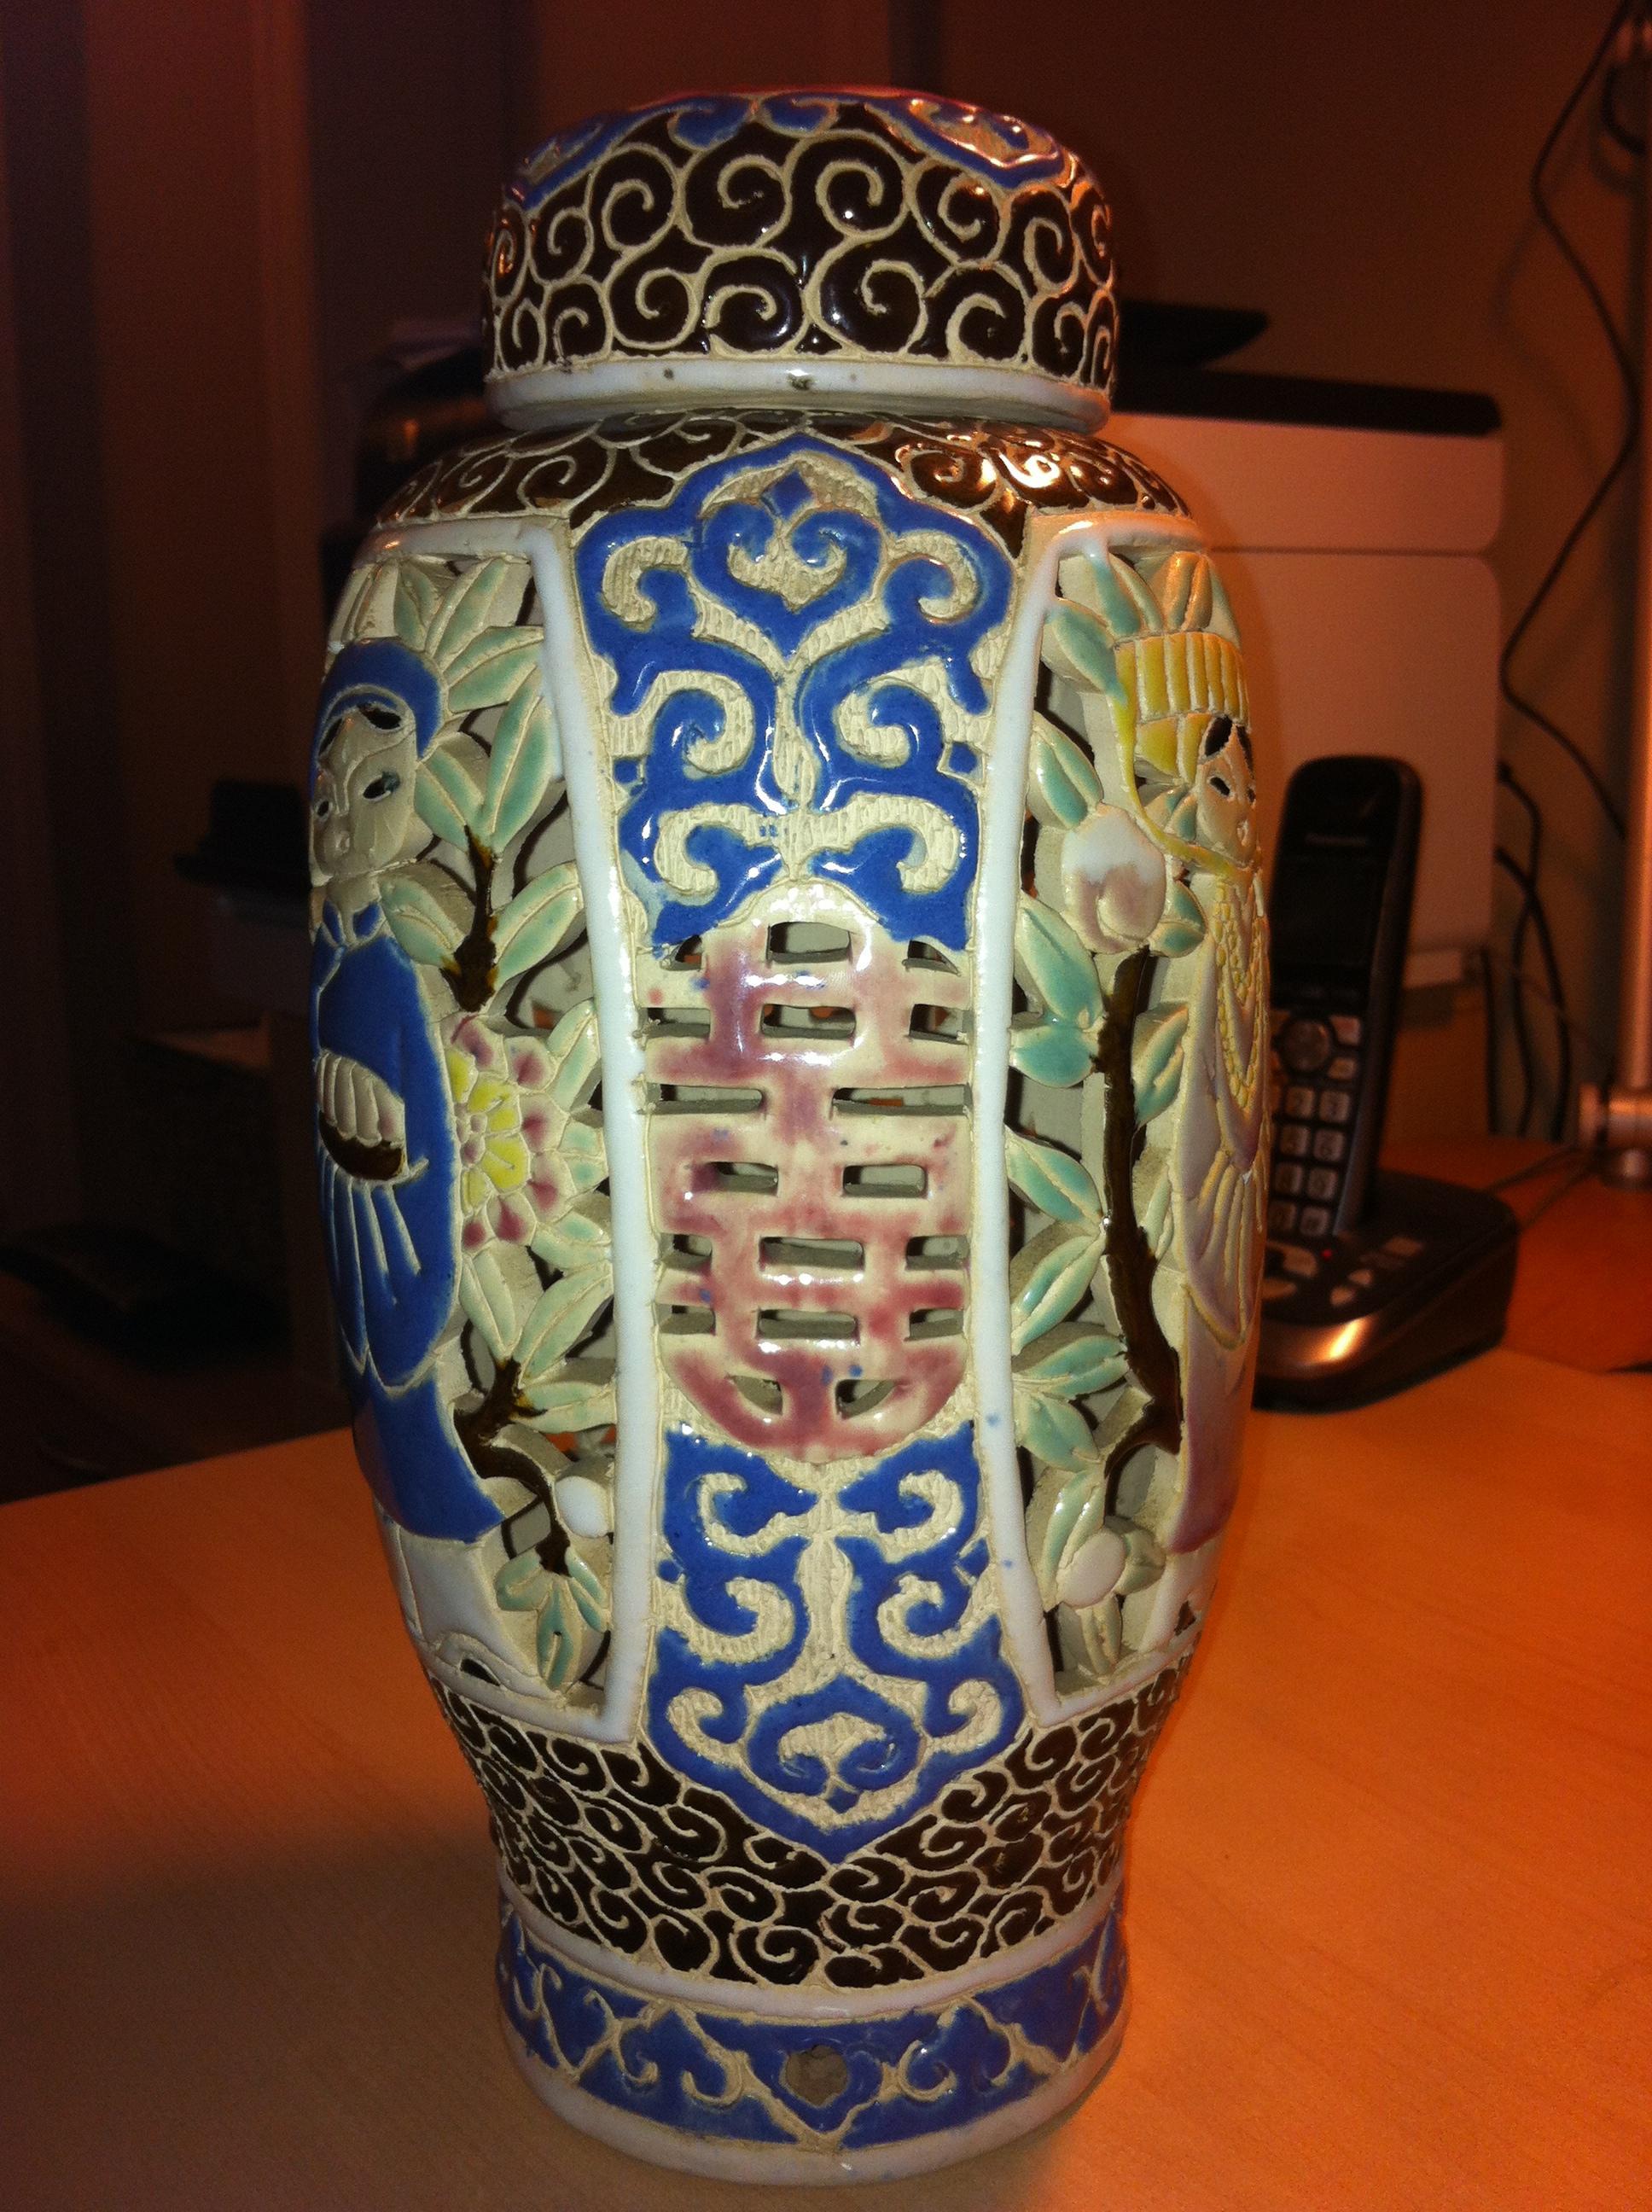 Dona Vietnam Vase Antique Appraisal Instappraisal